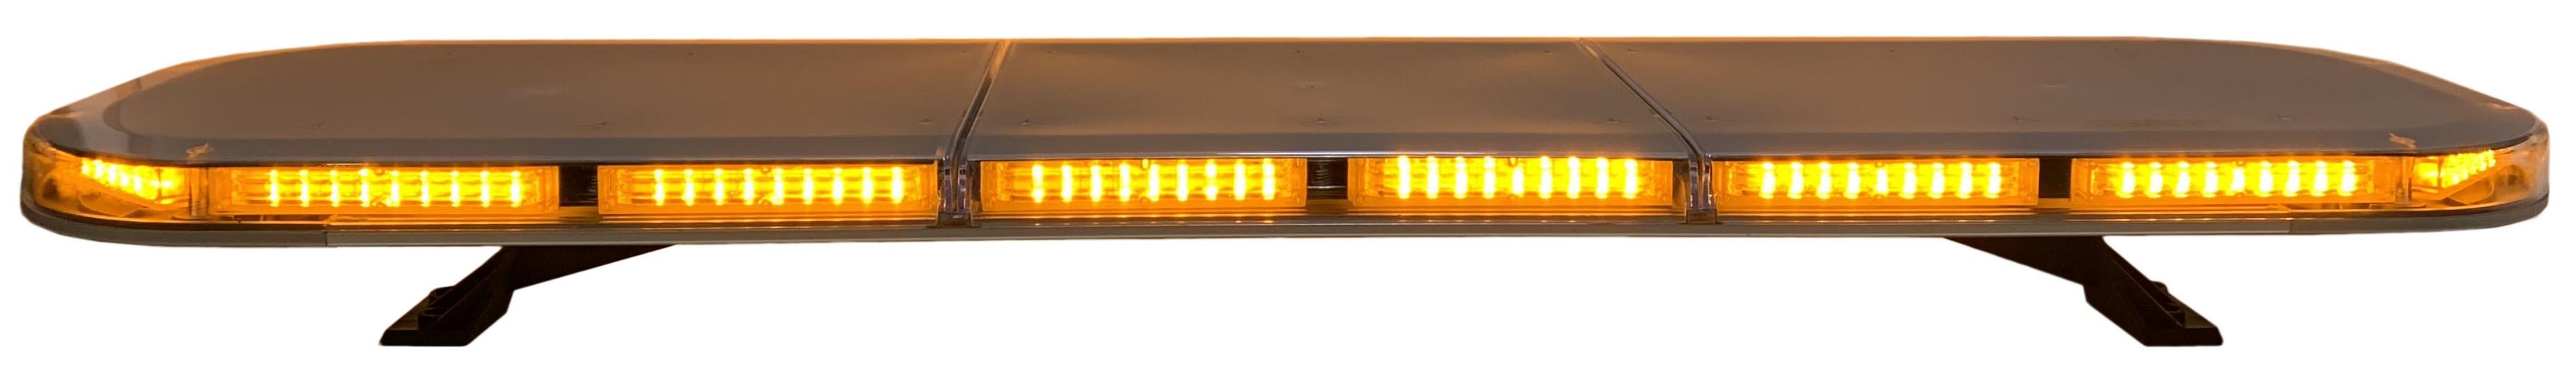 BELKA OSTRZEGAWCZA LED 120cm KOGUT NA DACH 12V 24V